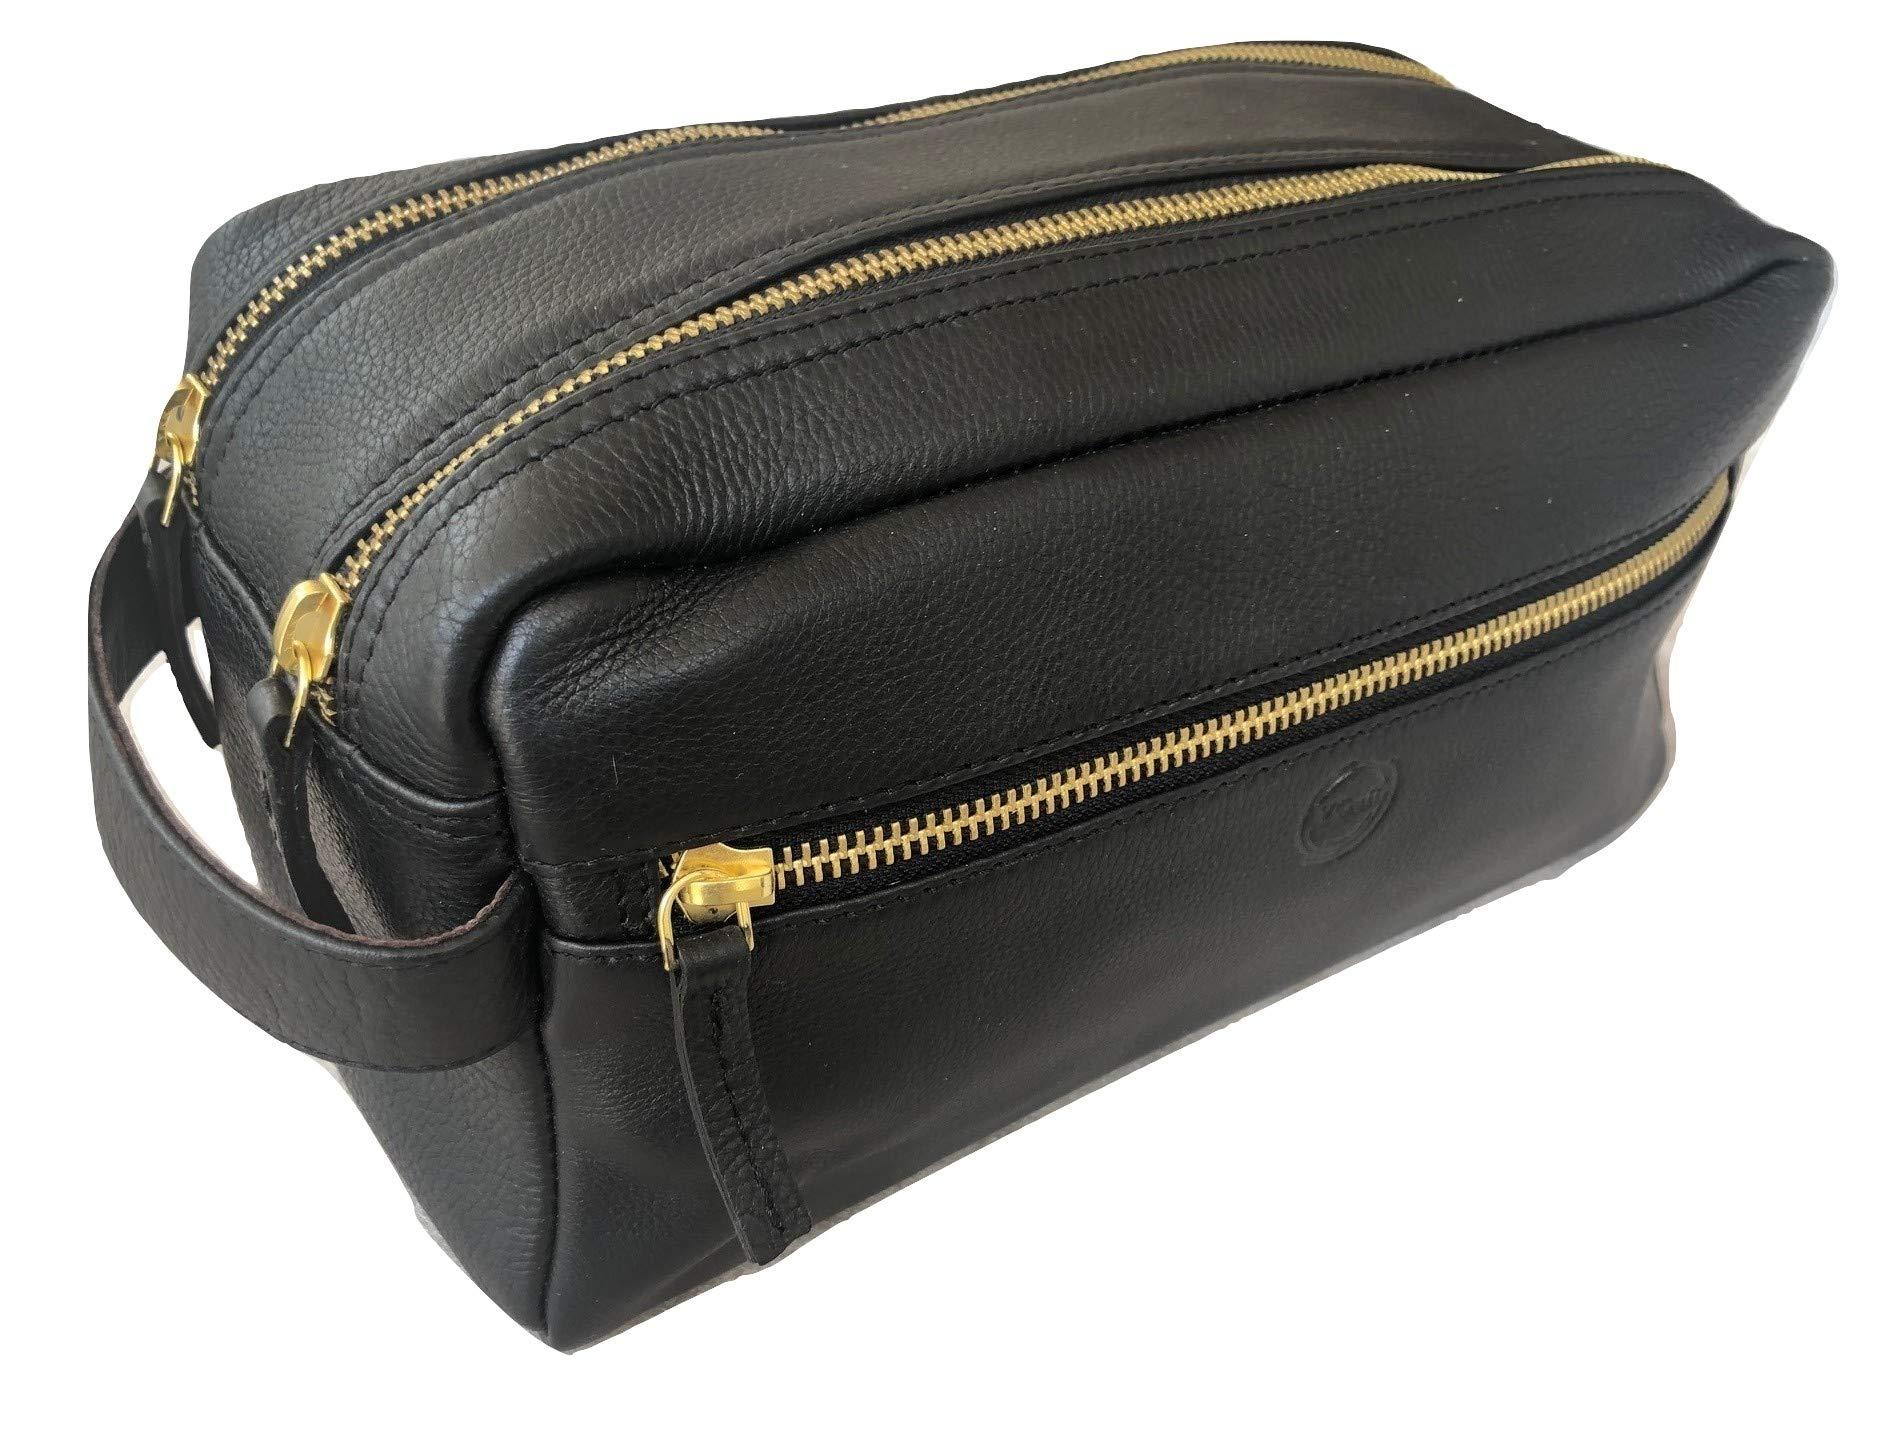 Leather Toiletry Bag for Men or Women Handmade Travel Dopp Kit Shaving Bag Makeup Organizer Perfect Gift for Men Women by Vintage Crafts